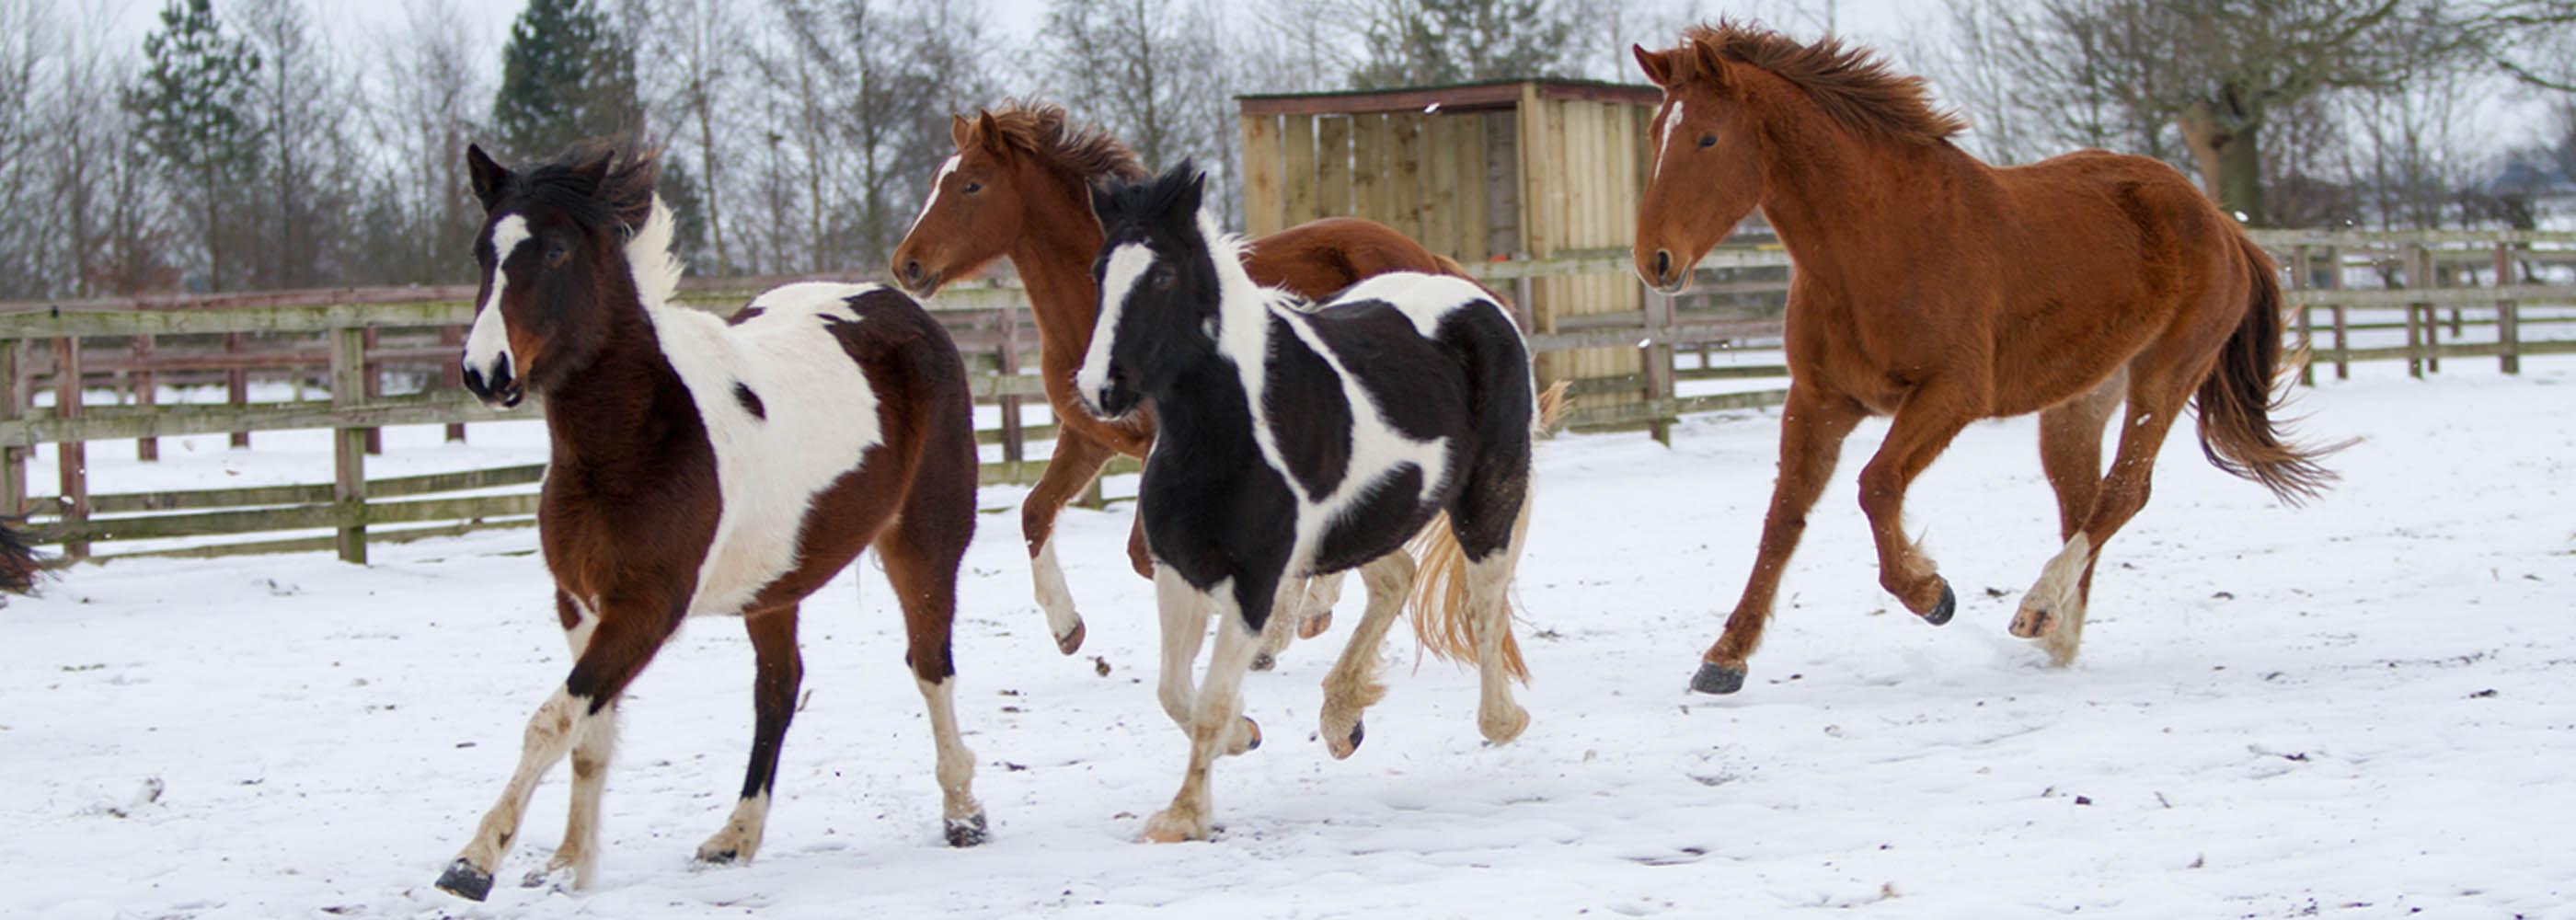 Winter Horse Care Tips World Horse Welfare